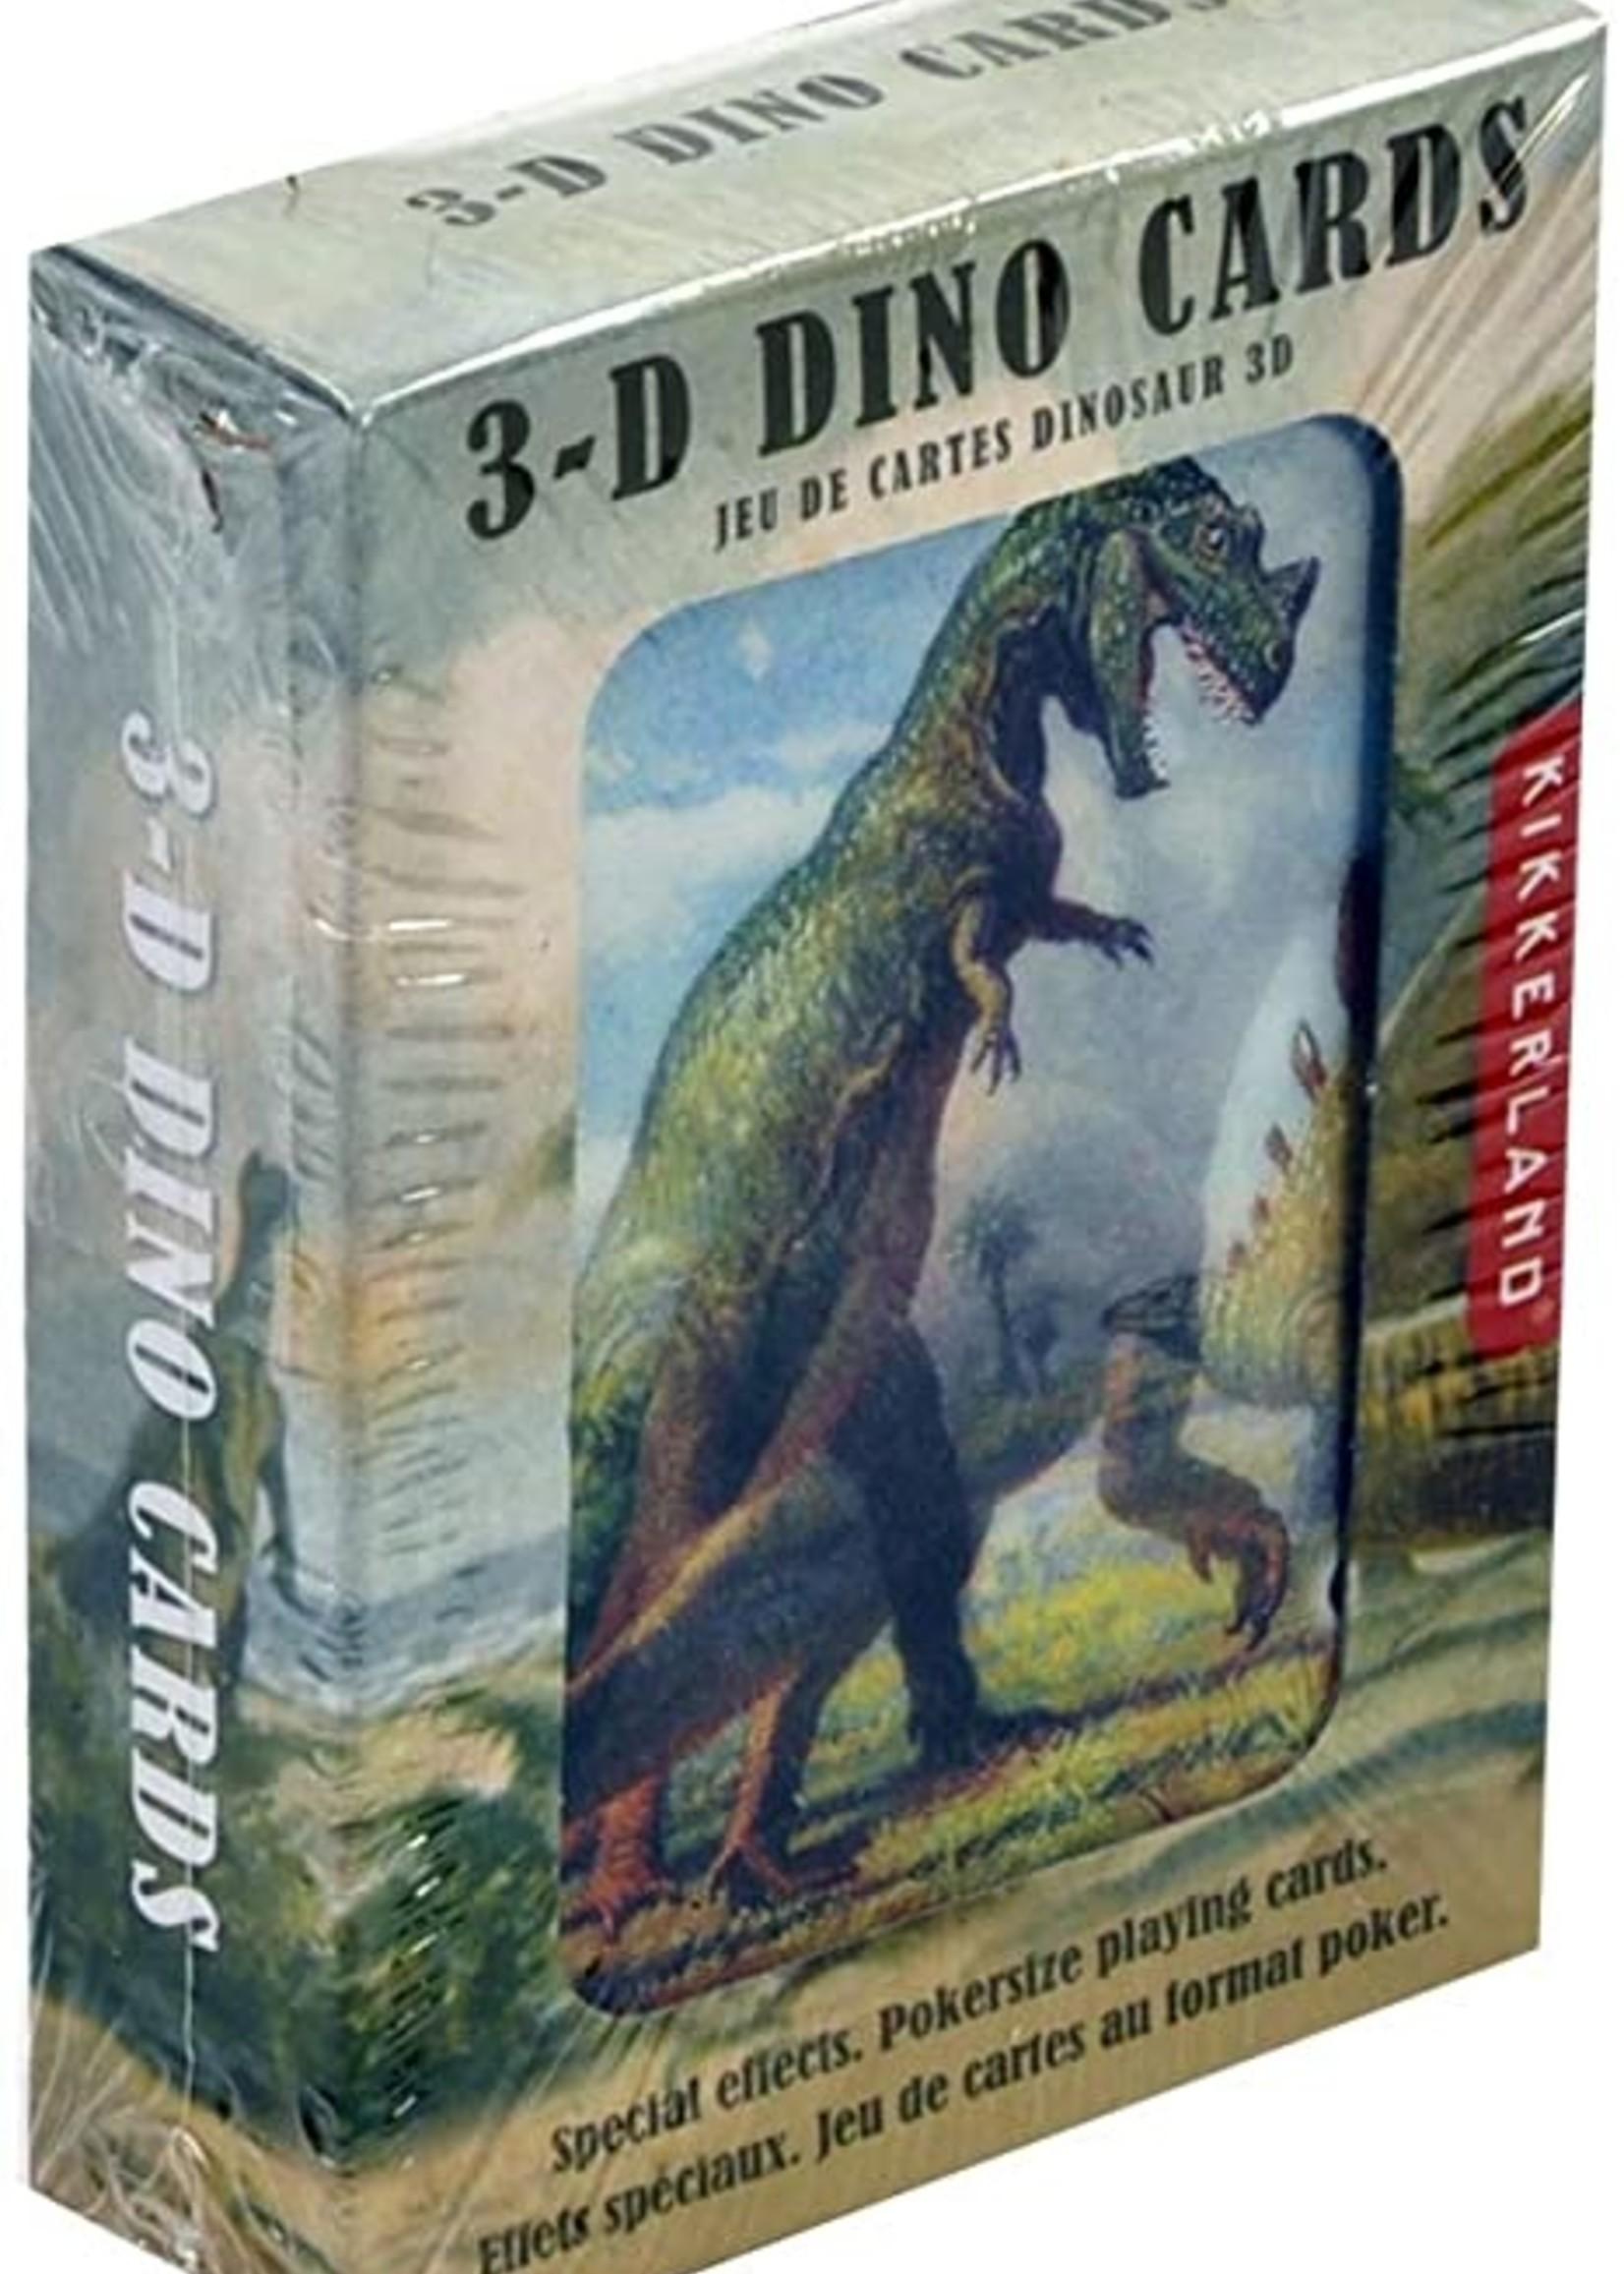 3D Dinosaur Playing Cards - Box